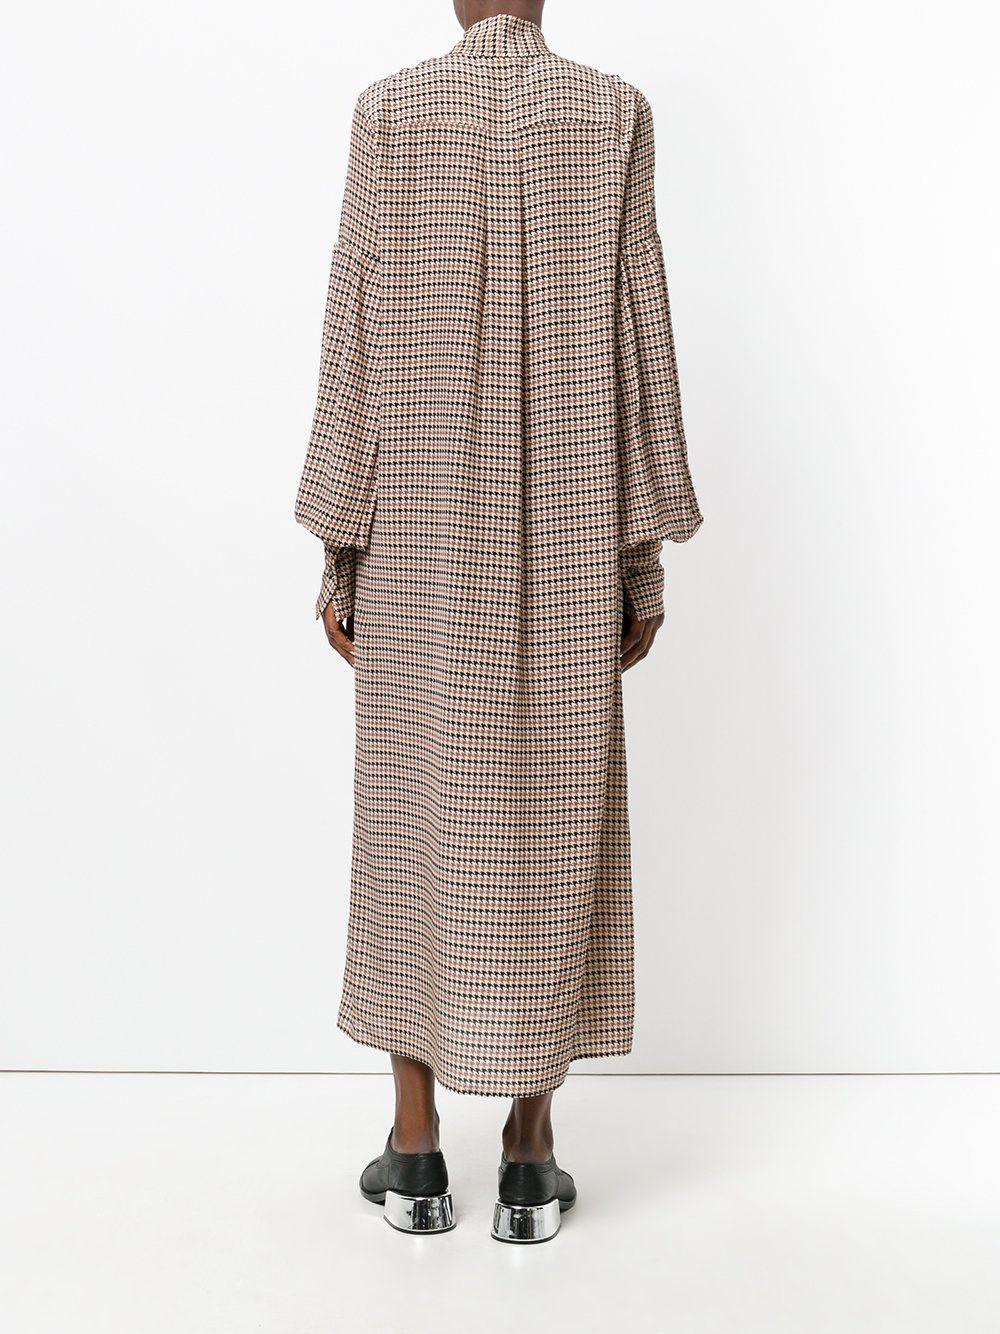 DRESSES - Long dresses Rokh Marketable Cheap Price Sale Amazing Price Supply Cheap Price Free Shipping Fake AvRHXlrVe